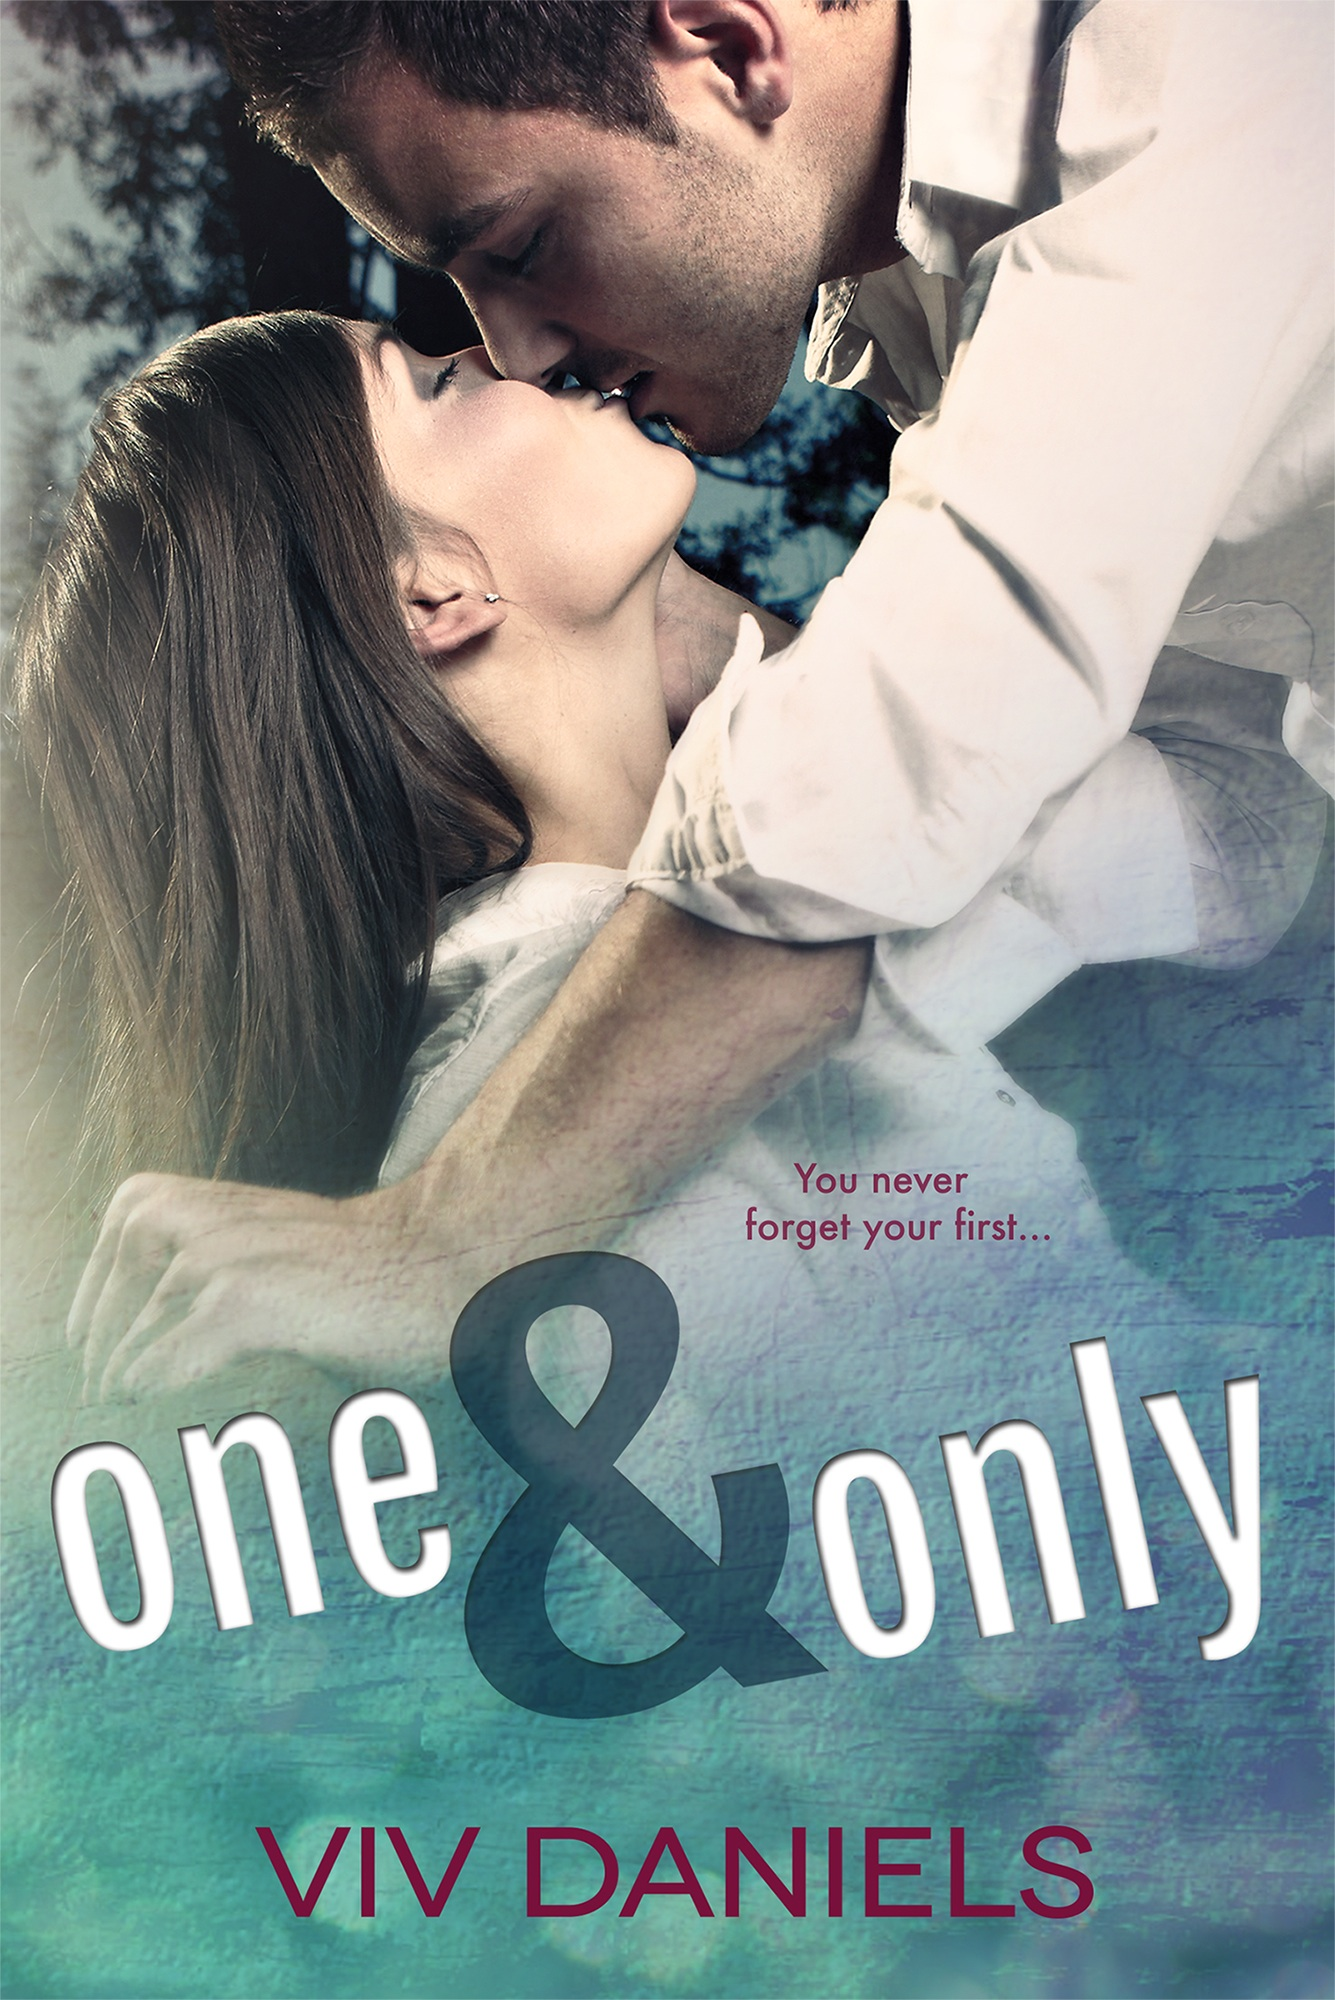 One & Only by Viv Daniels on Clear Eyes, Full Shelves